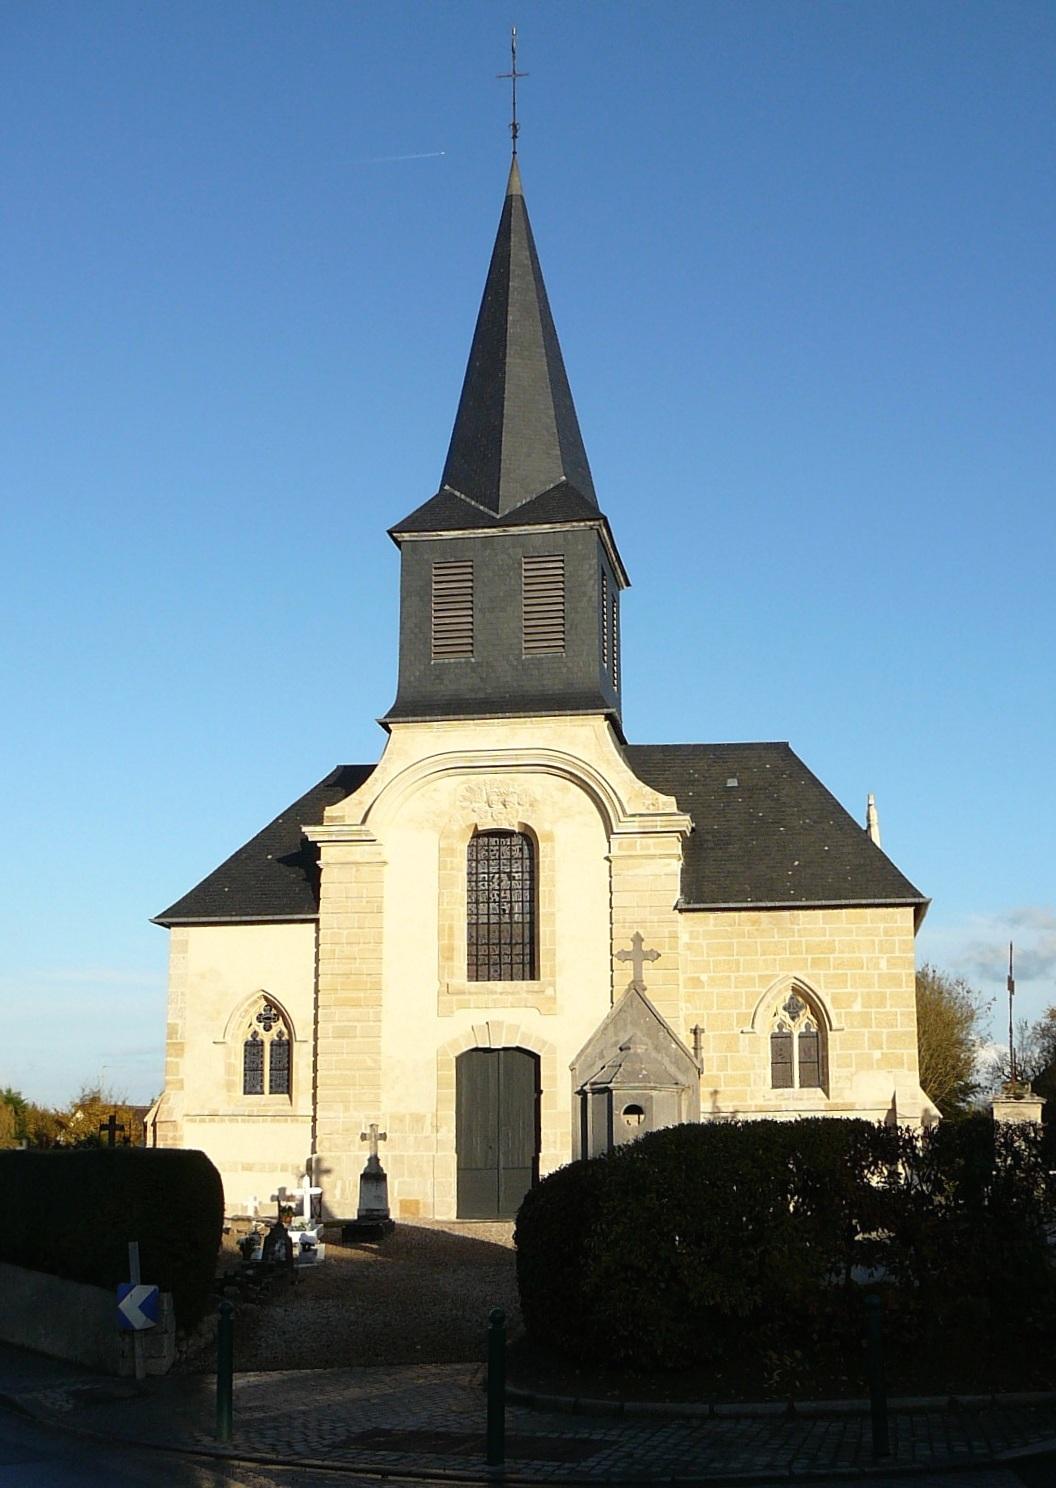 Eglise%2BTourgeville%2Bapre%25CC%2580s%2B%25281%2529.jpg